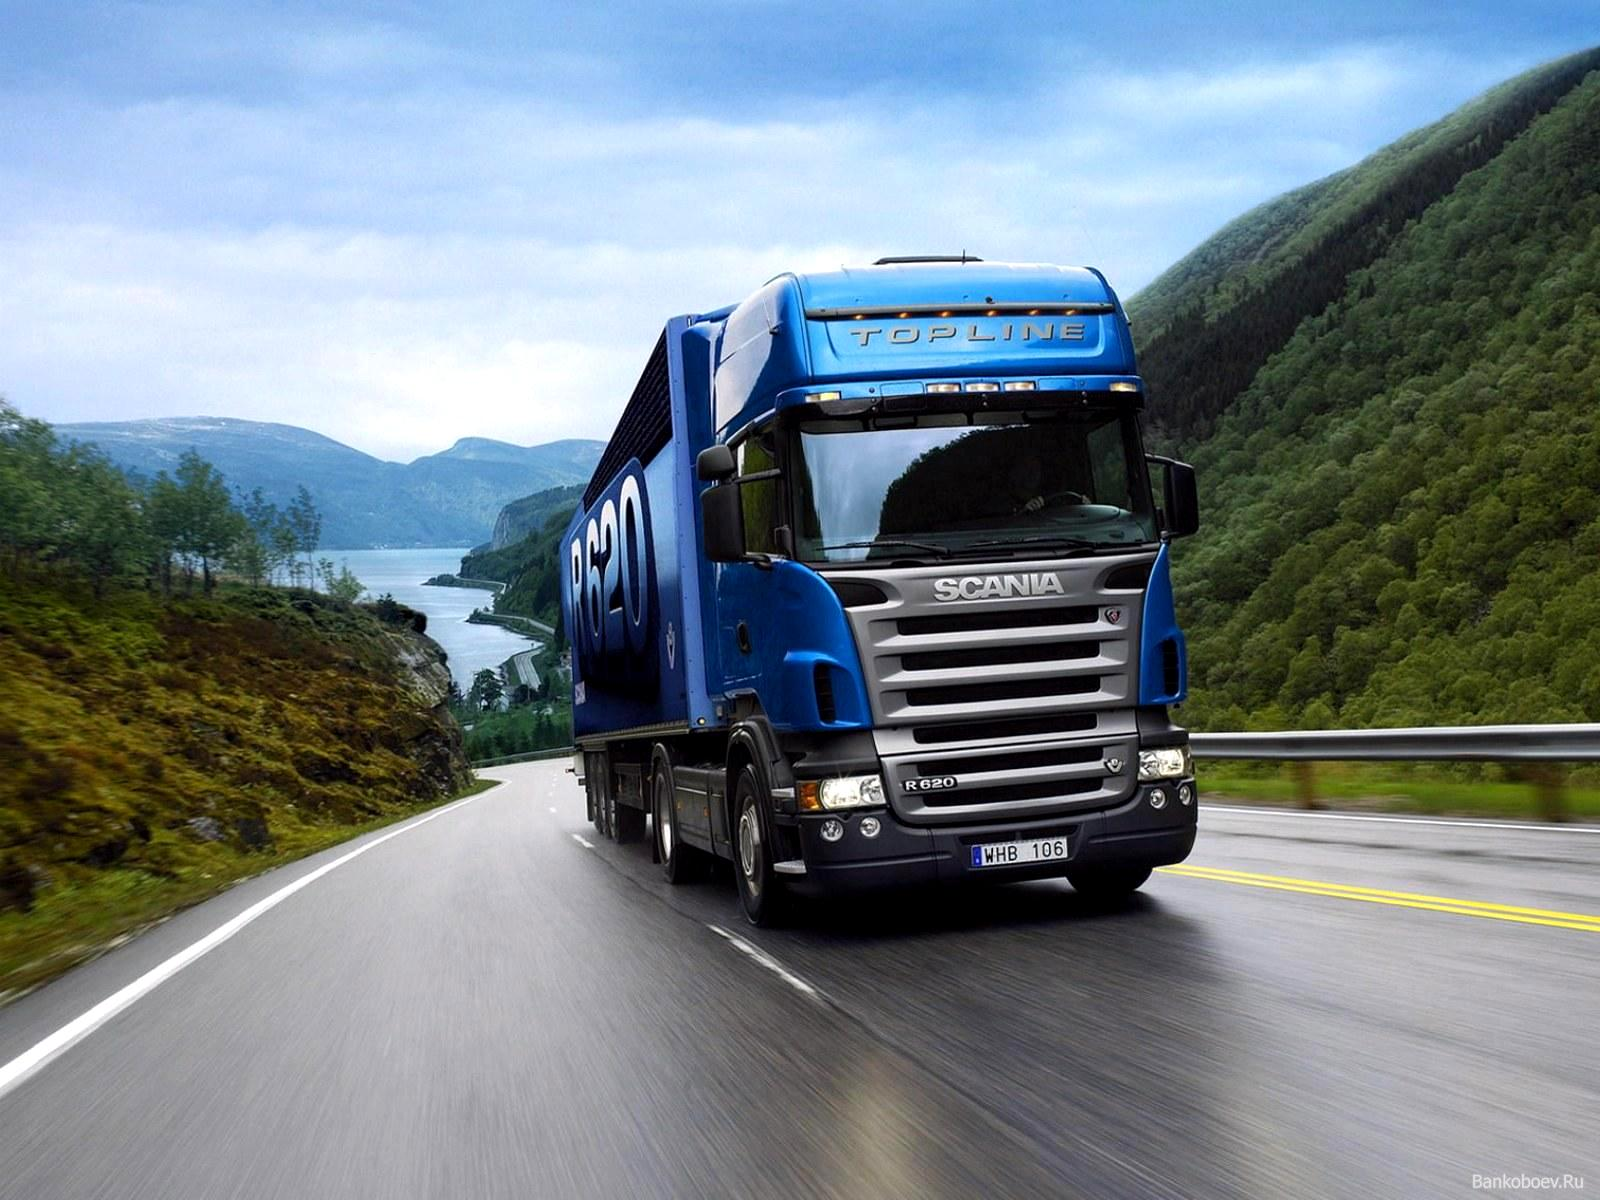 Scania Trucks Wallpapers Wallpaper Scania Truck Wallpaper